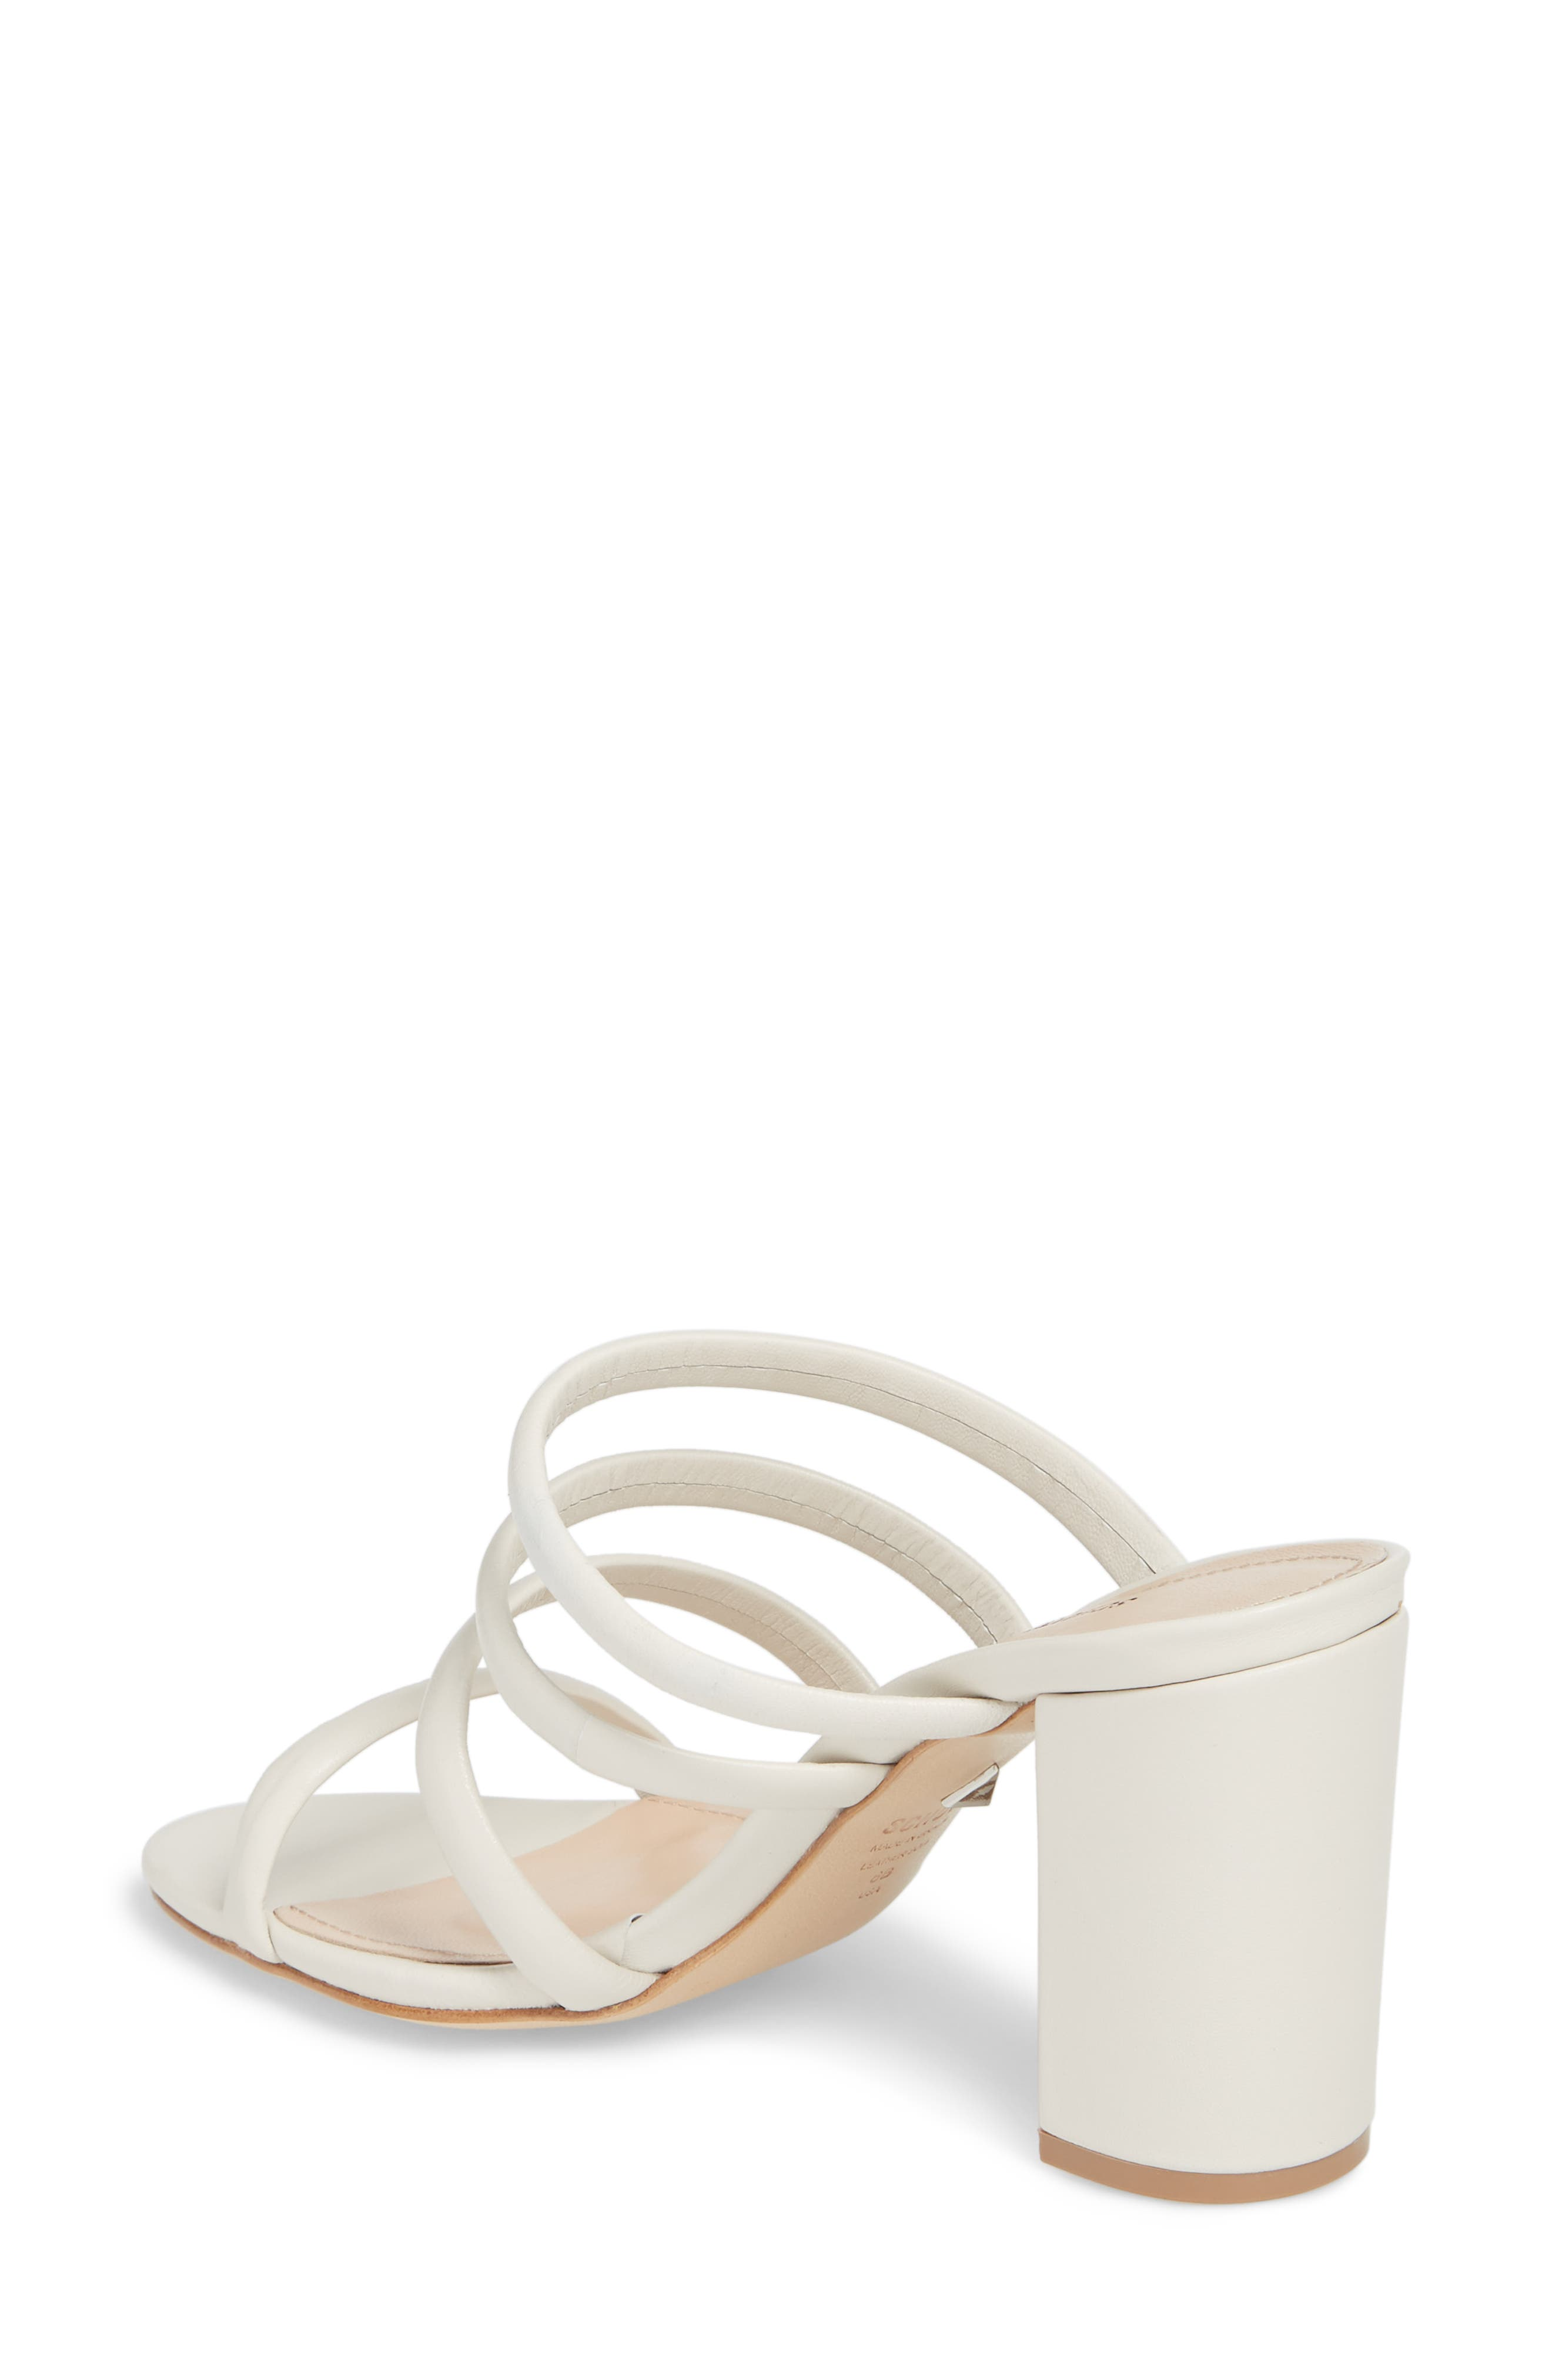 Felisa Block Heel Sandal,                             Alternate thumbnail 2, color,                             Pearl Leather